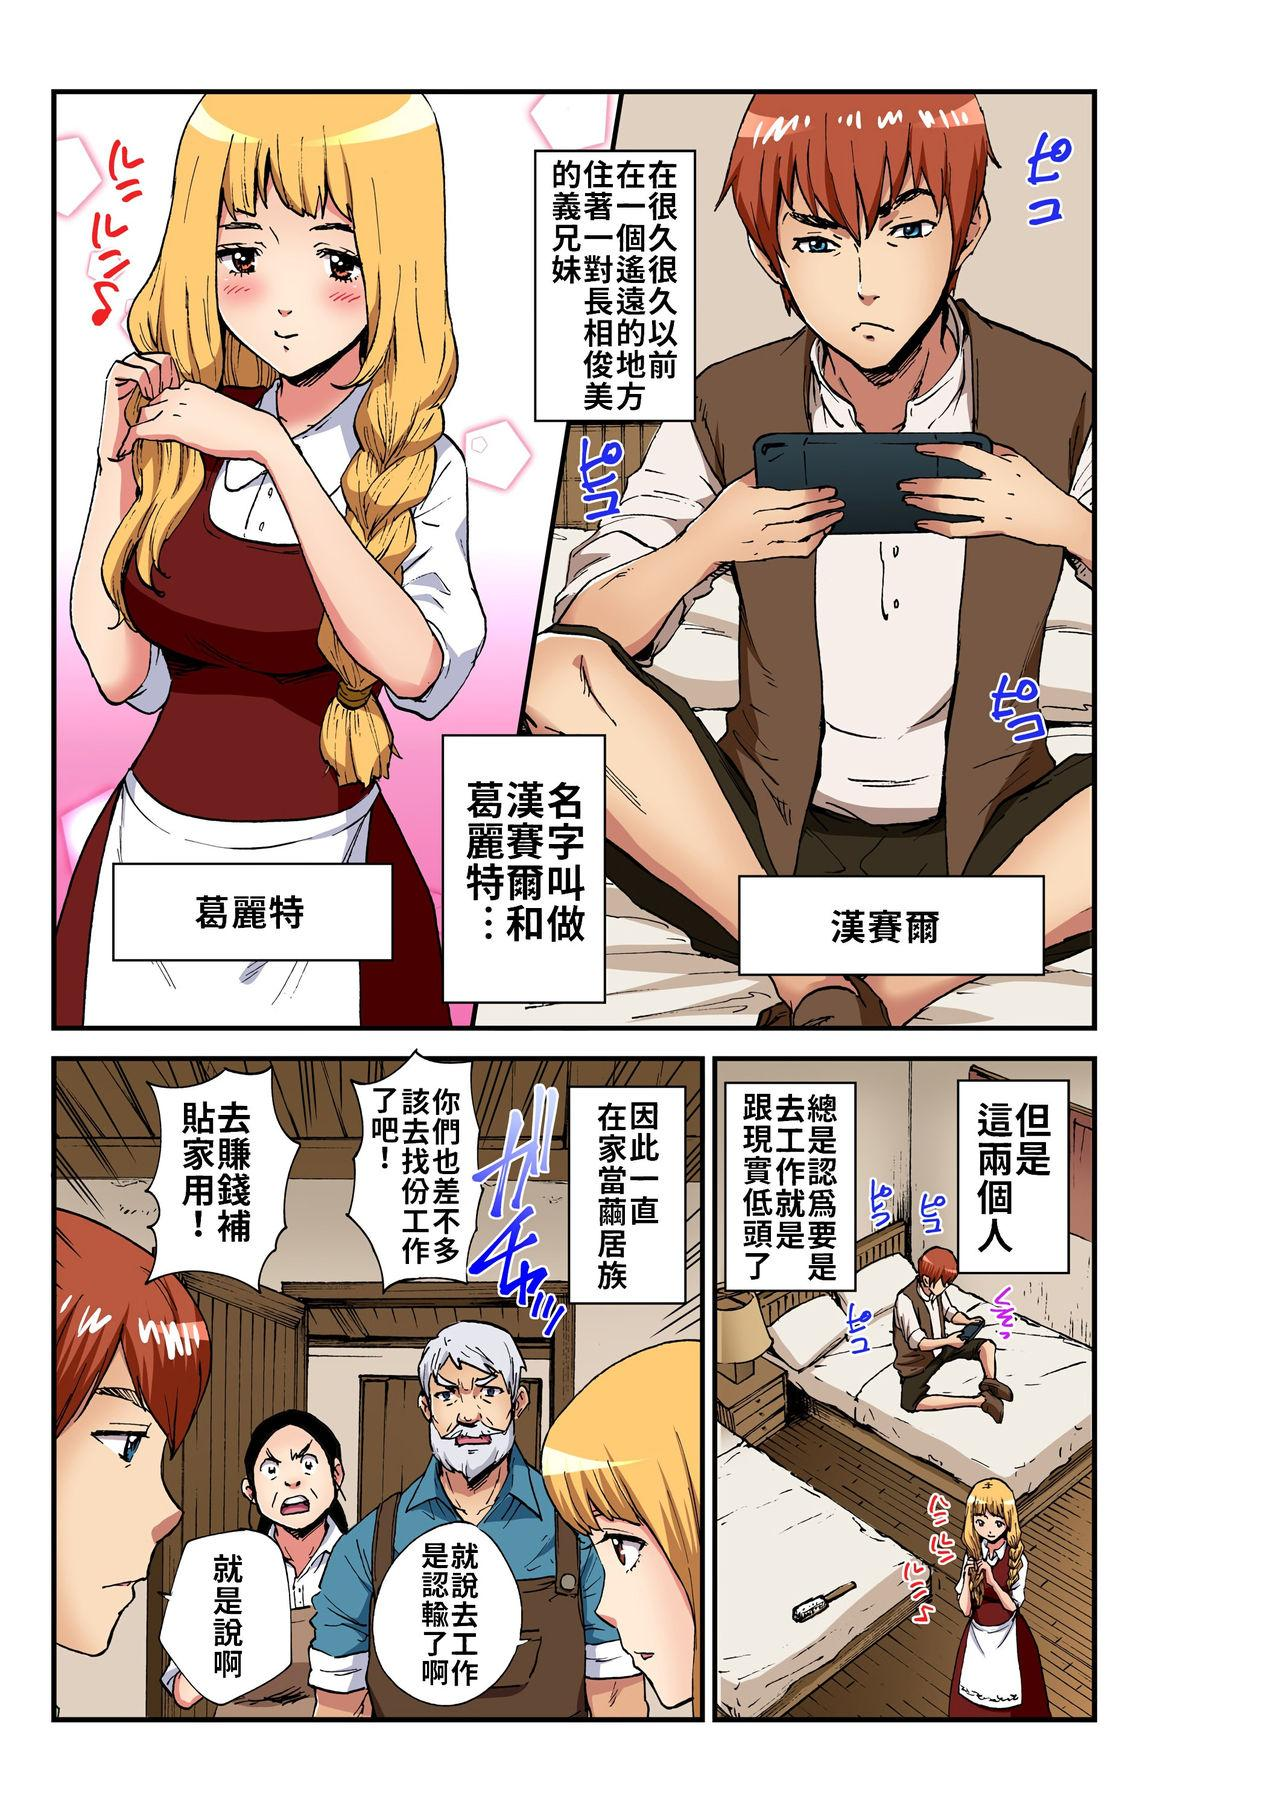 Otona no Douwa ~Henzeru to Gure-teru   大人的童話~糖果屋 1